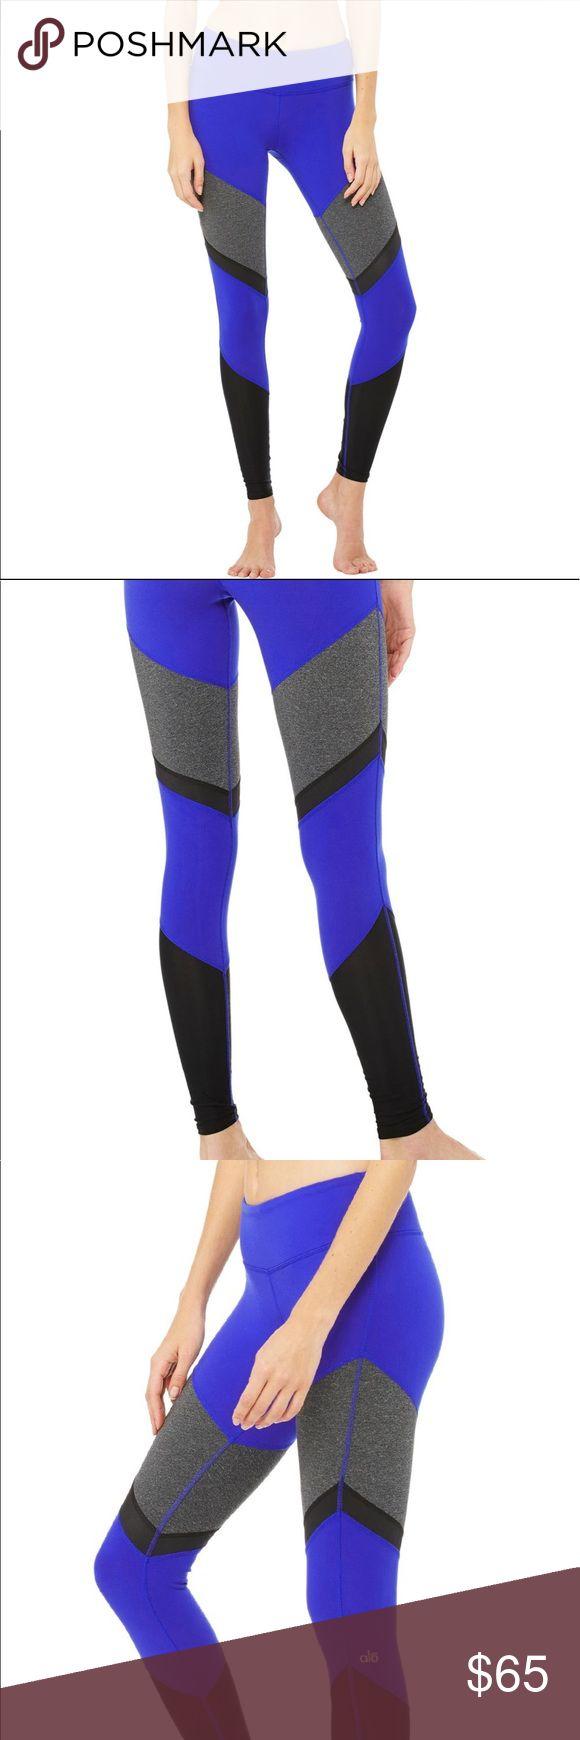 ALO Yoga Sheila Legging Small Electric Blue SHEILA LEGGING - DEEP ELECTRIC BLUE/STORMY HEATHER/BLACK GLOSSY/BLACK. Like new. Worn 2x. Too small for me. ALO Yoga Pants Leggings